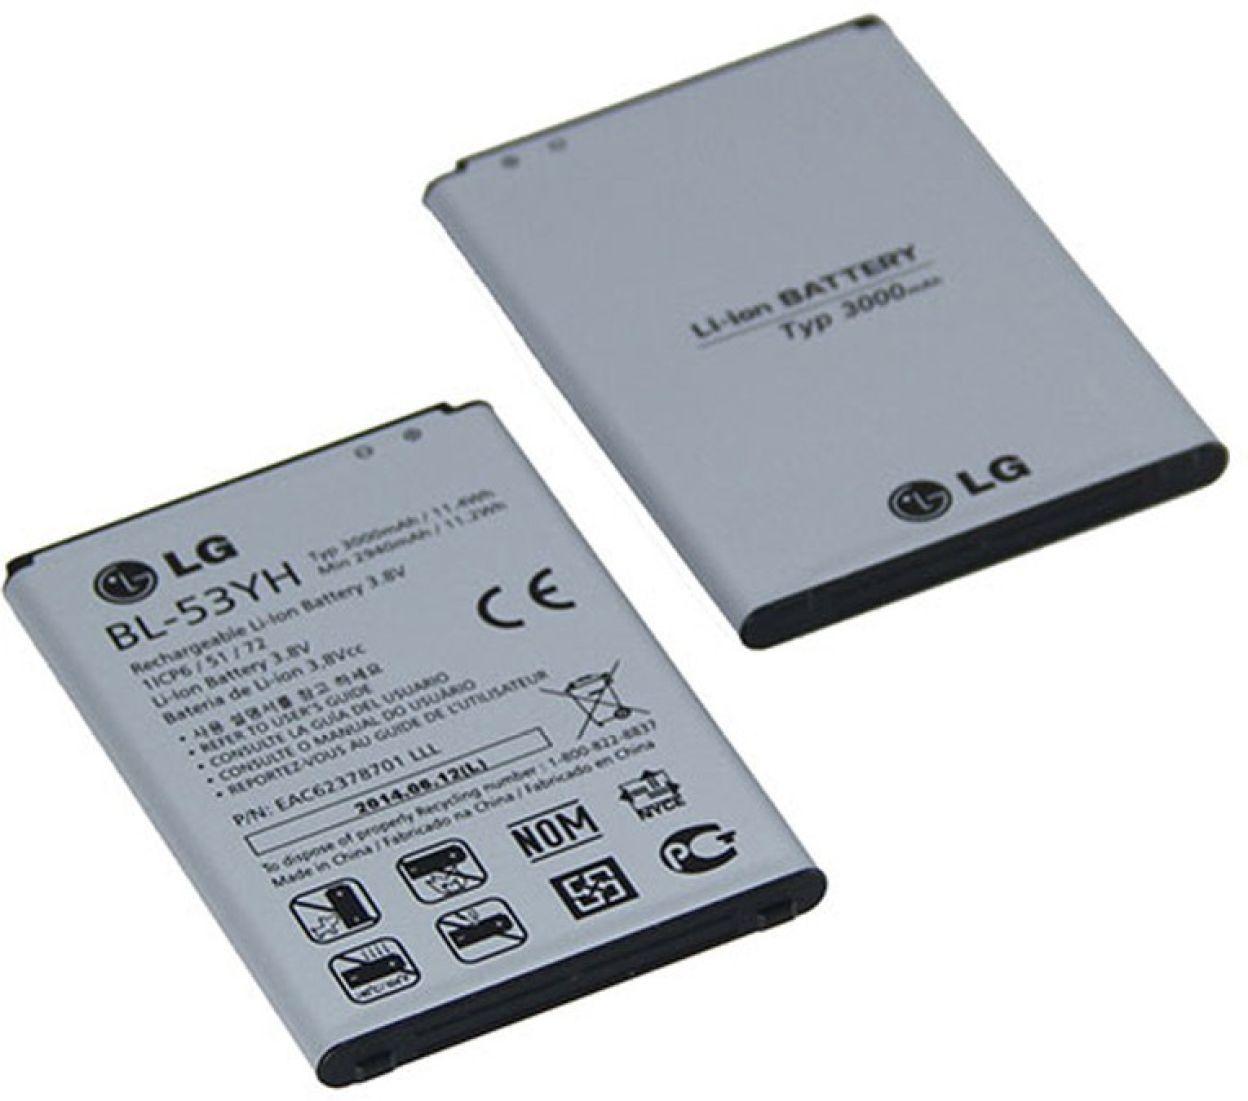 LG BL-53YH 3000mAh Battery